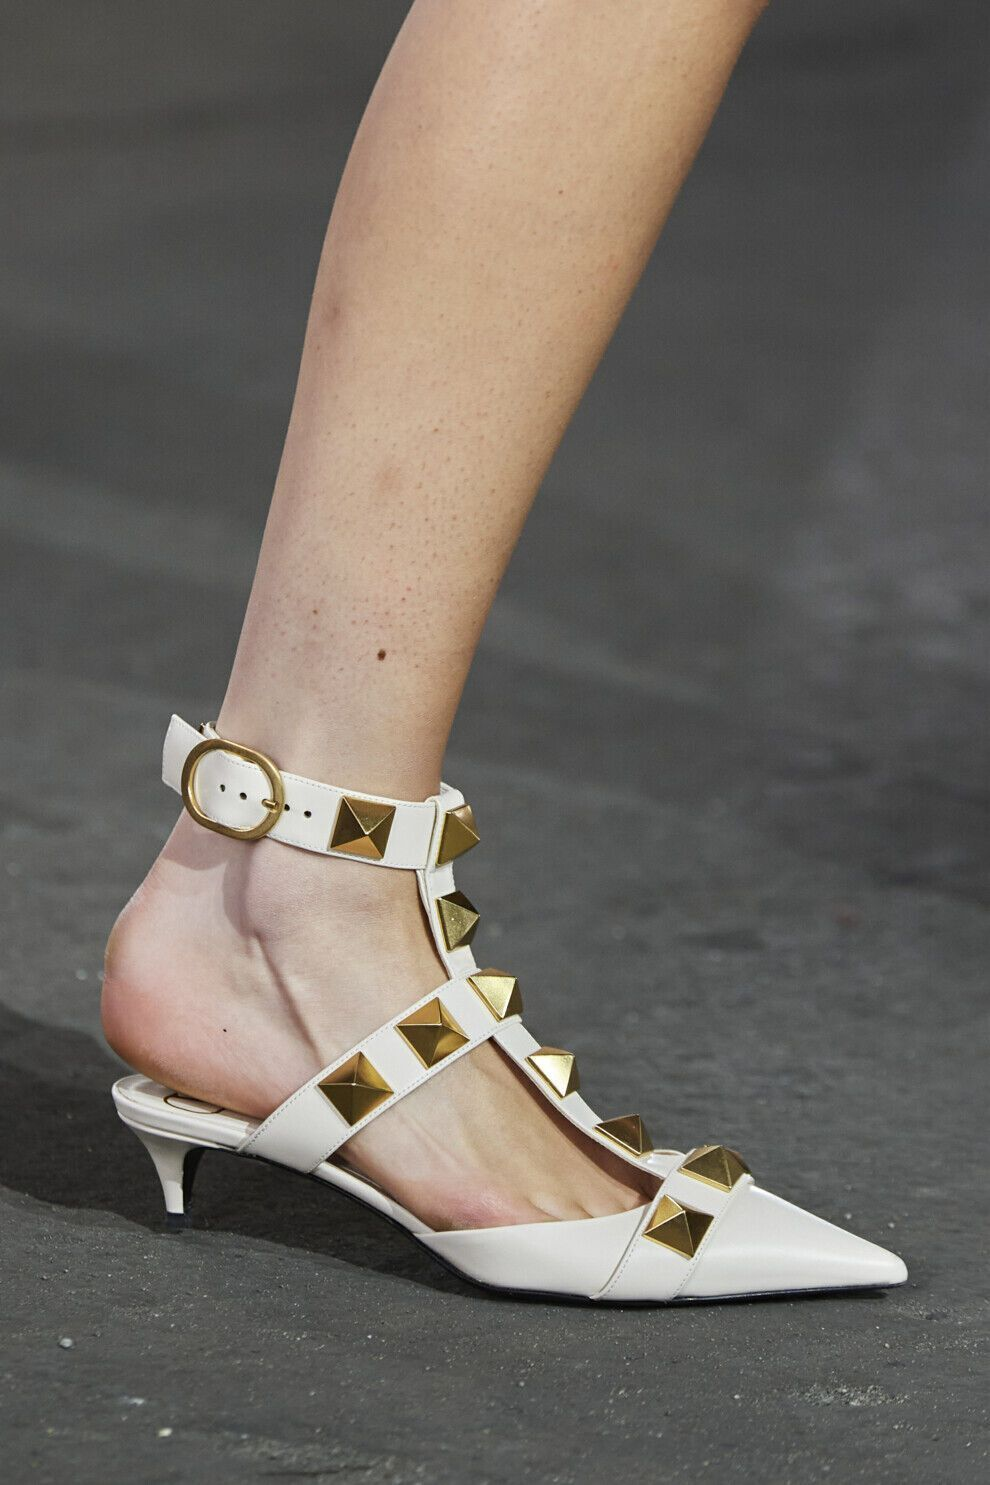 Valentino прикрасили туфлі масивними шипами